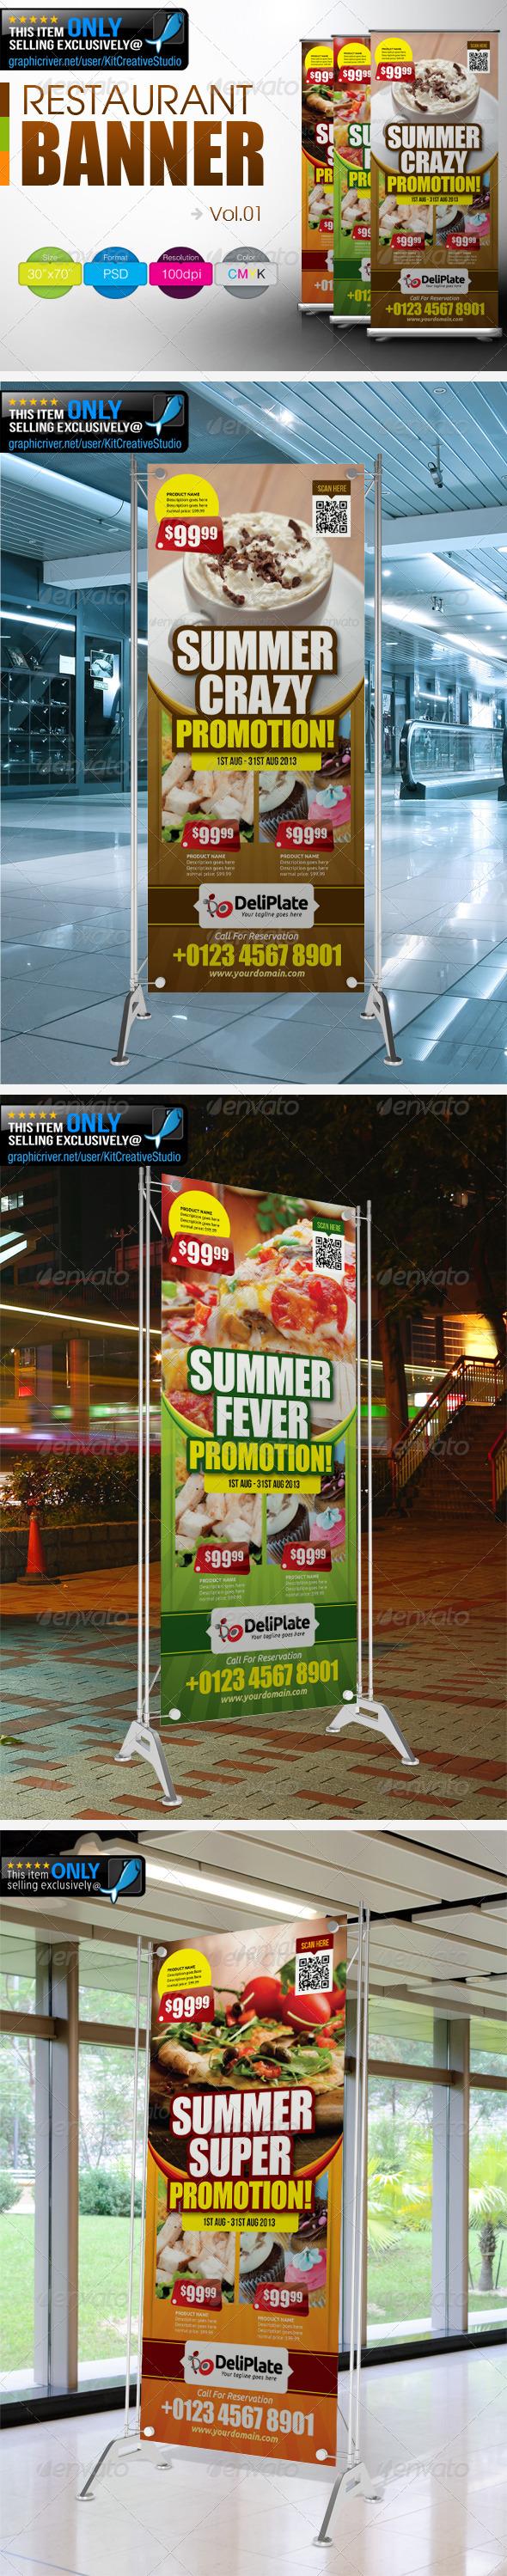 Restaurant Banner Vol.1 - Signage Print Templates